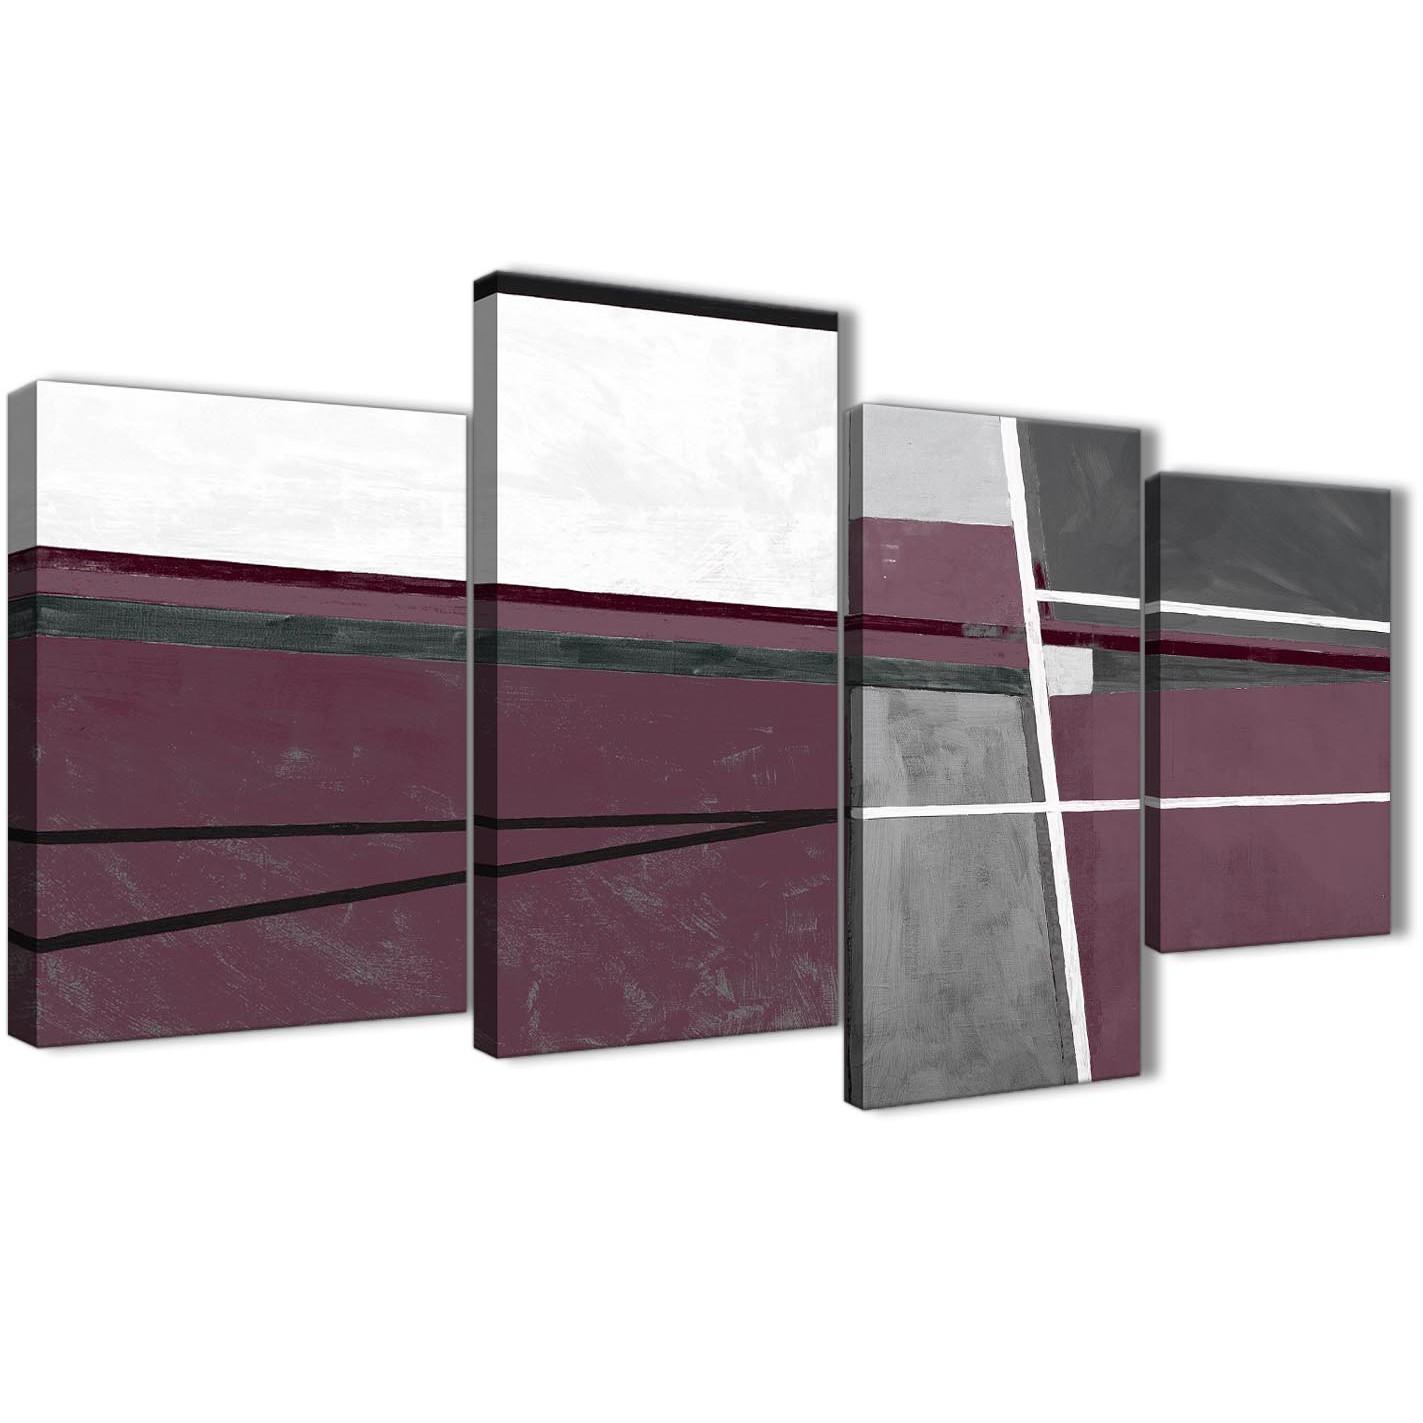 Plum Purple Grey Painting Kitchen Canvas Pictures: Large Plum Purple Grey Painting Abstract Living Room